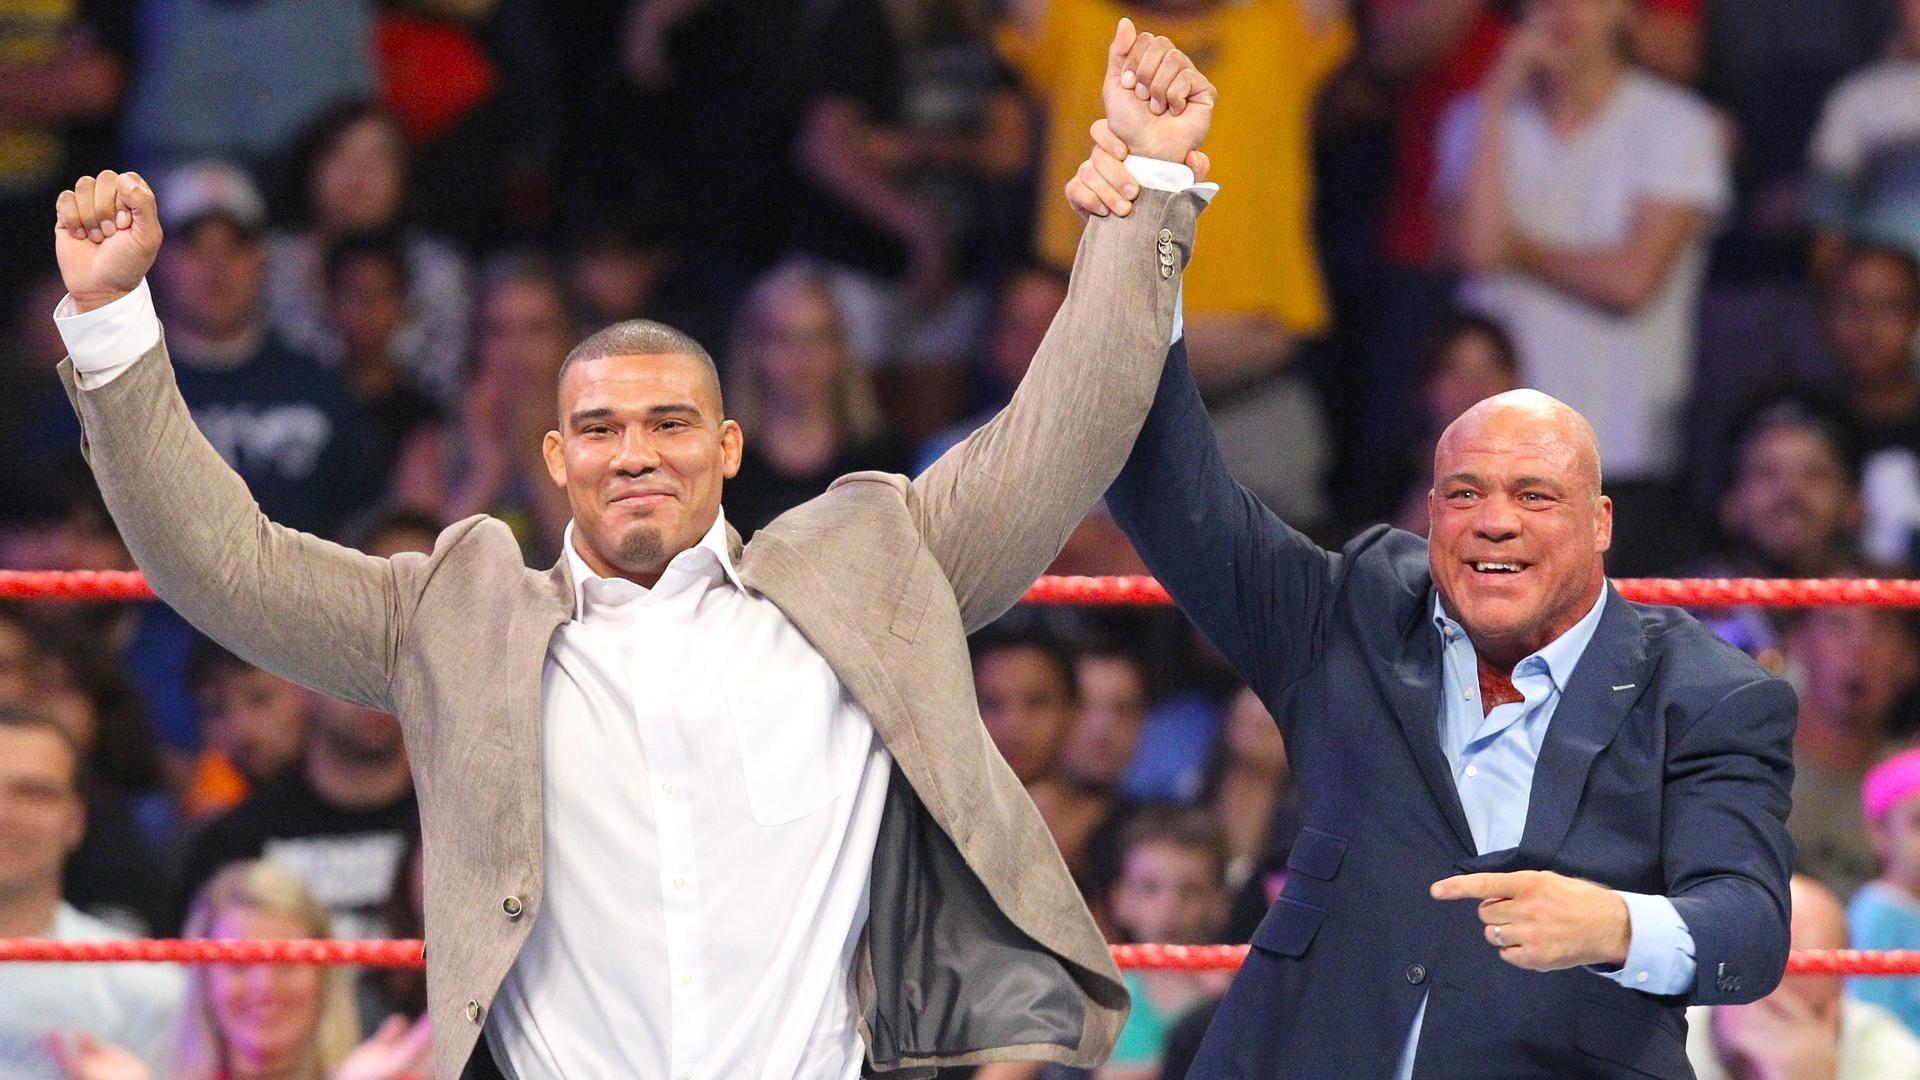 WWE Raw - Season 25 Episode 29 : July 17, 2017 (Nashville, Tennessee)